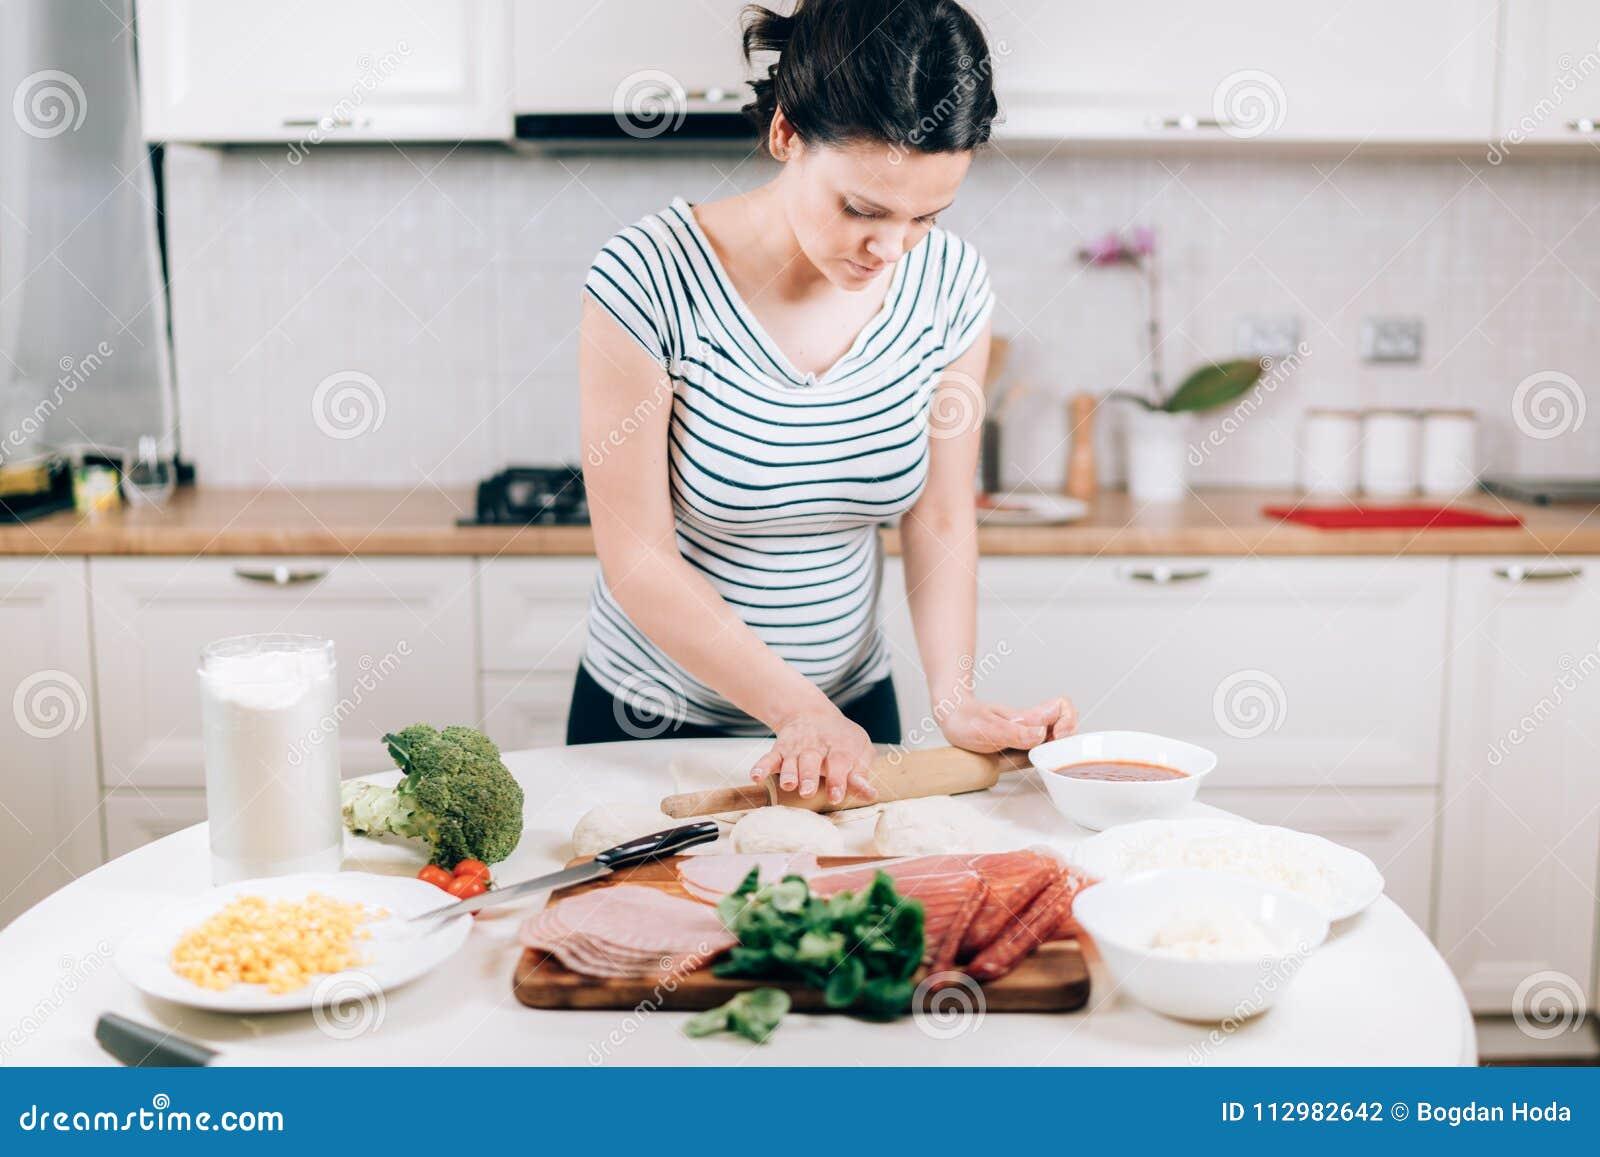 Young caucasian, beautiful pregnant woman preparing dough for pizza